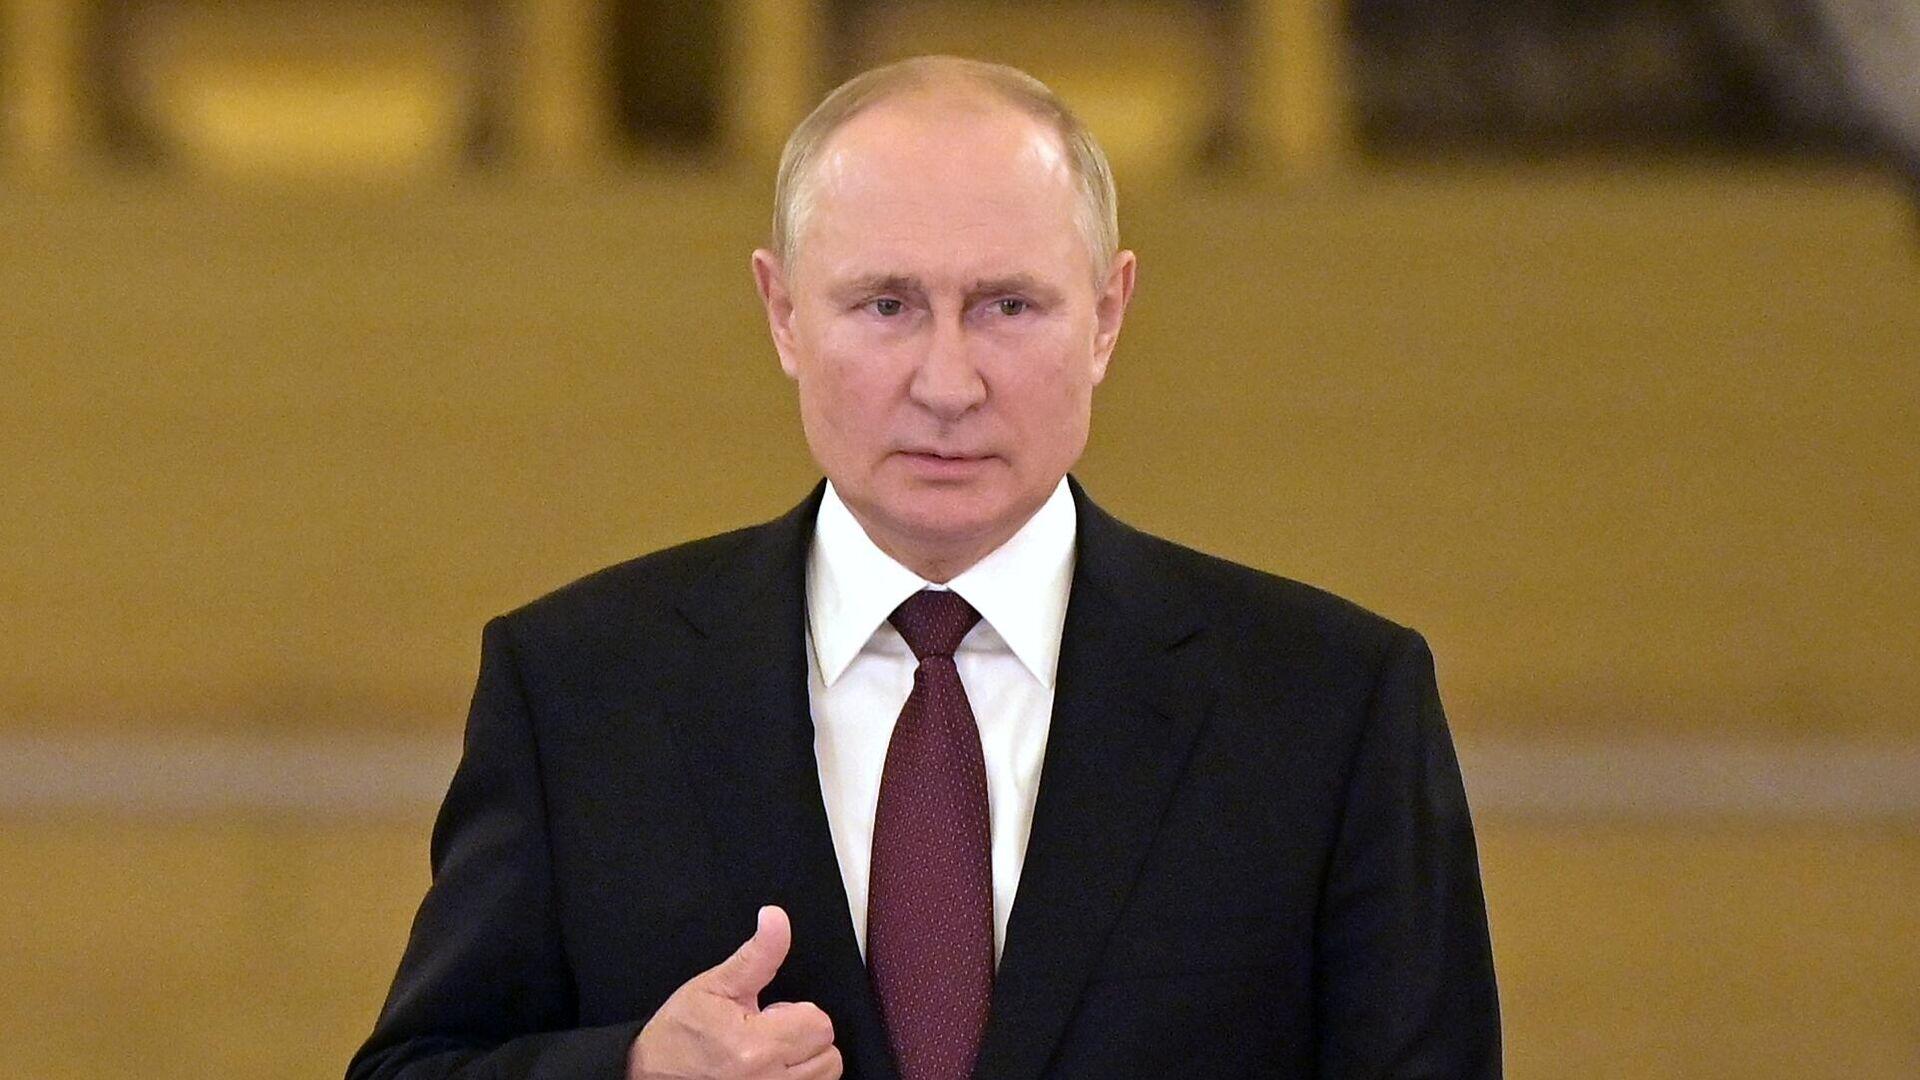 Президент РФ Владимир Путин - Sputnik Тоҷикистон, 1920, 21.08.2021